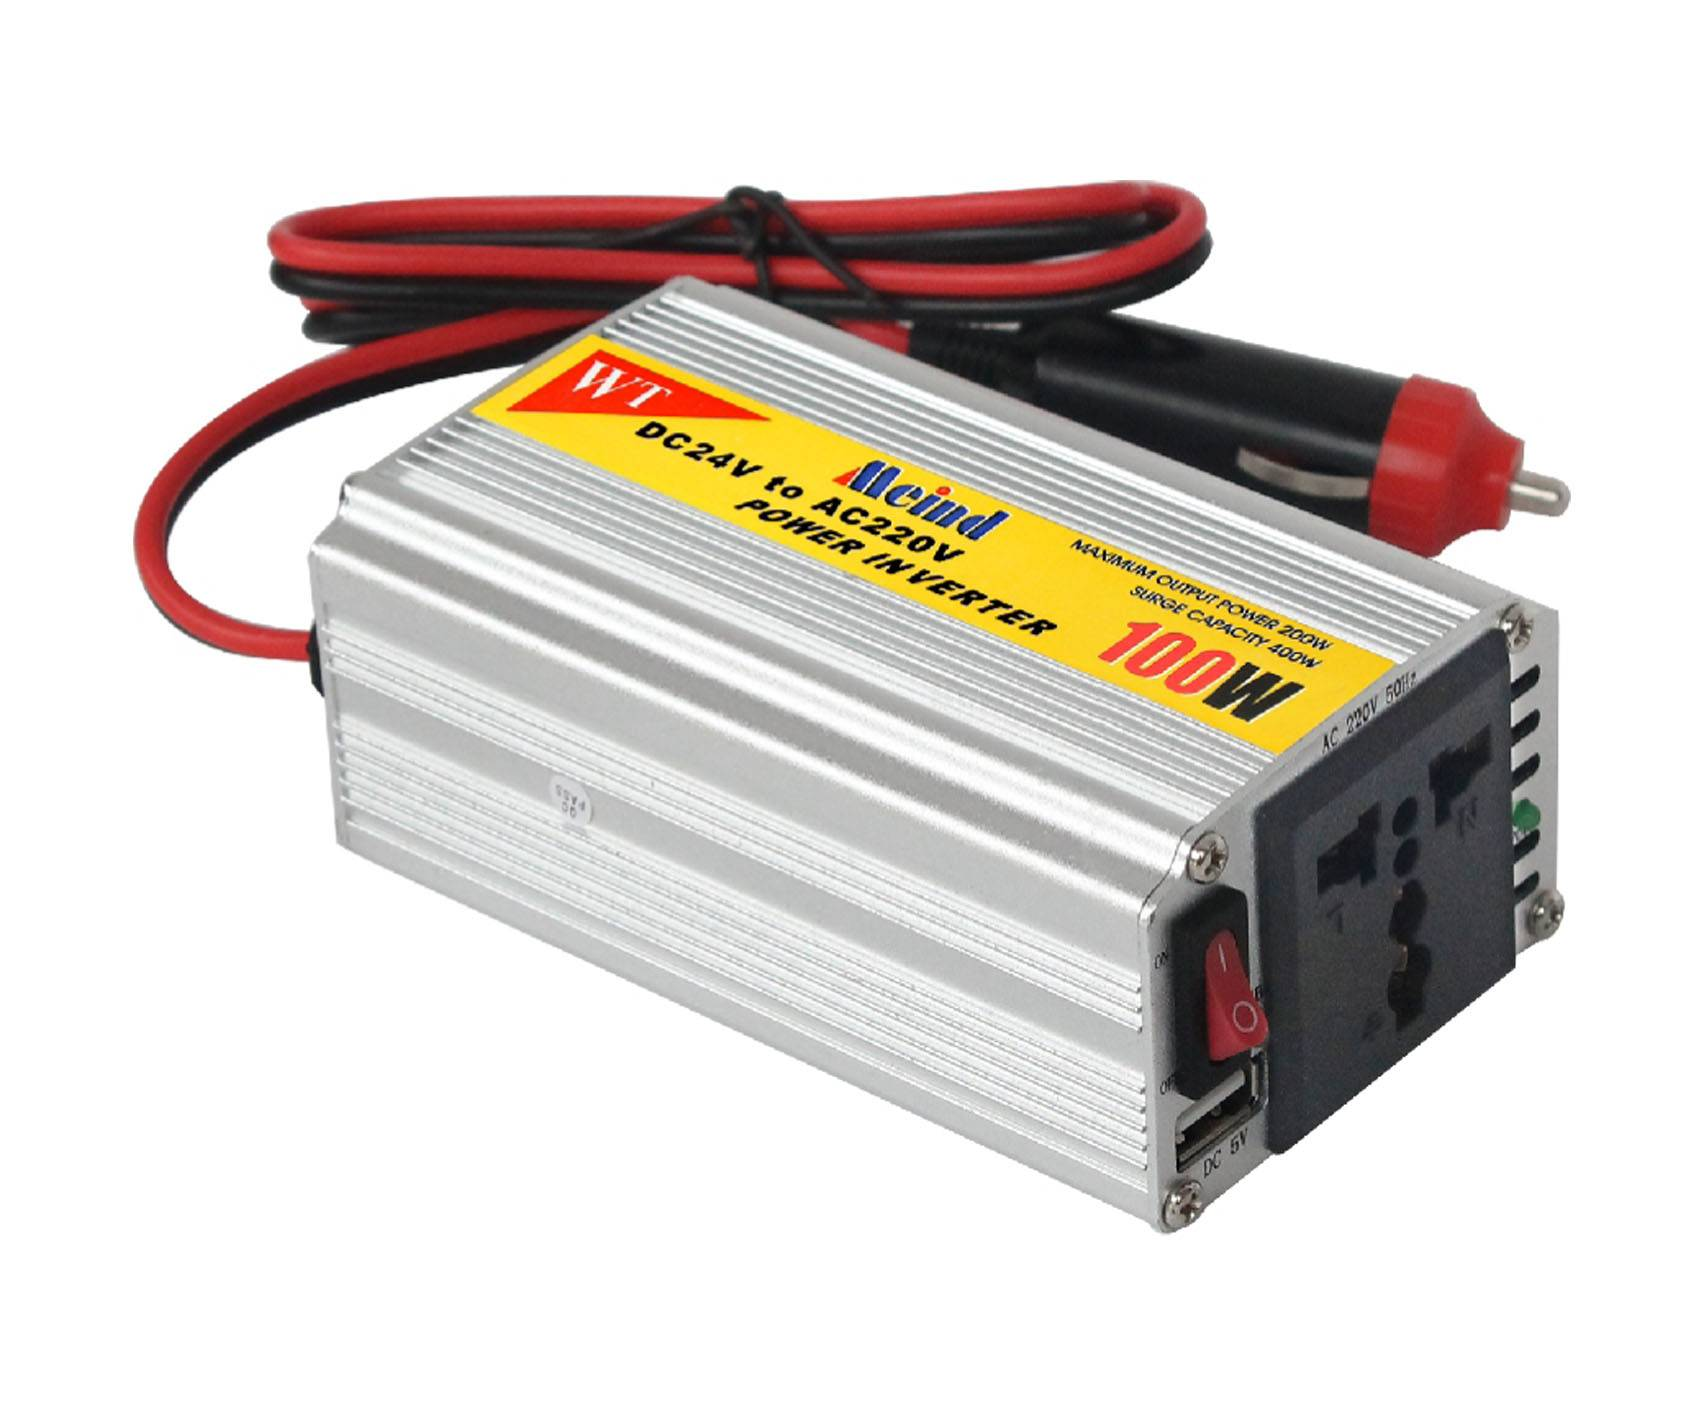 DC TO AC  sine wave car power inverter 100w